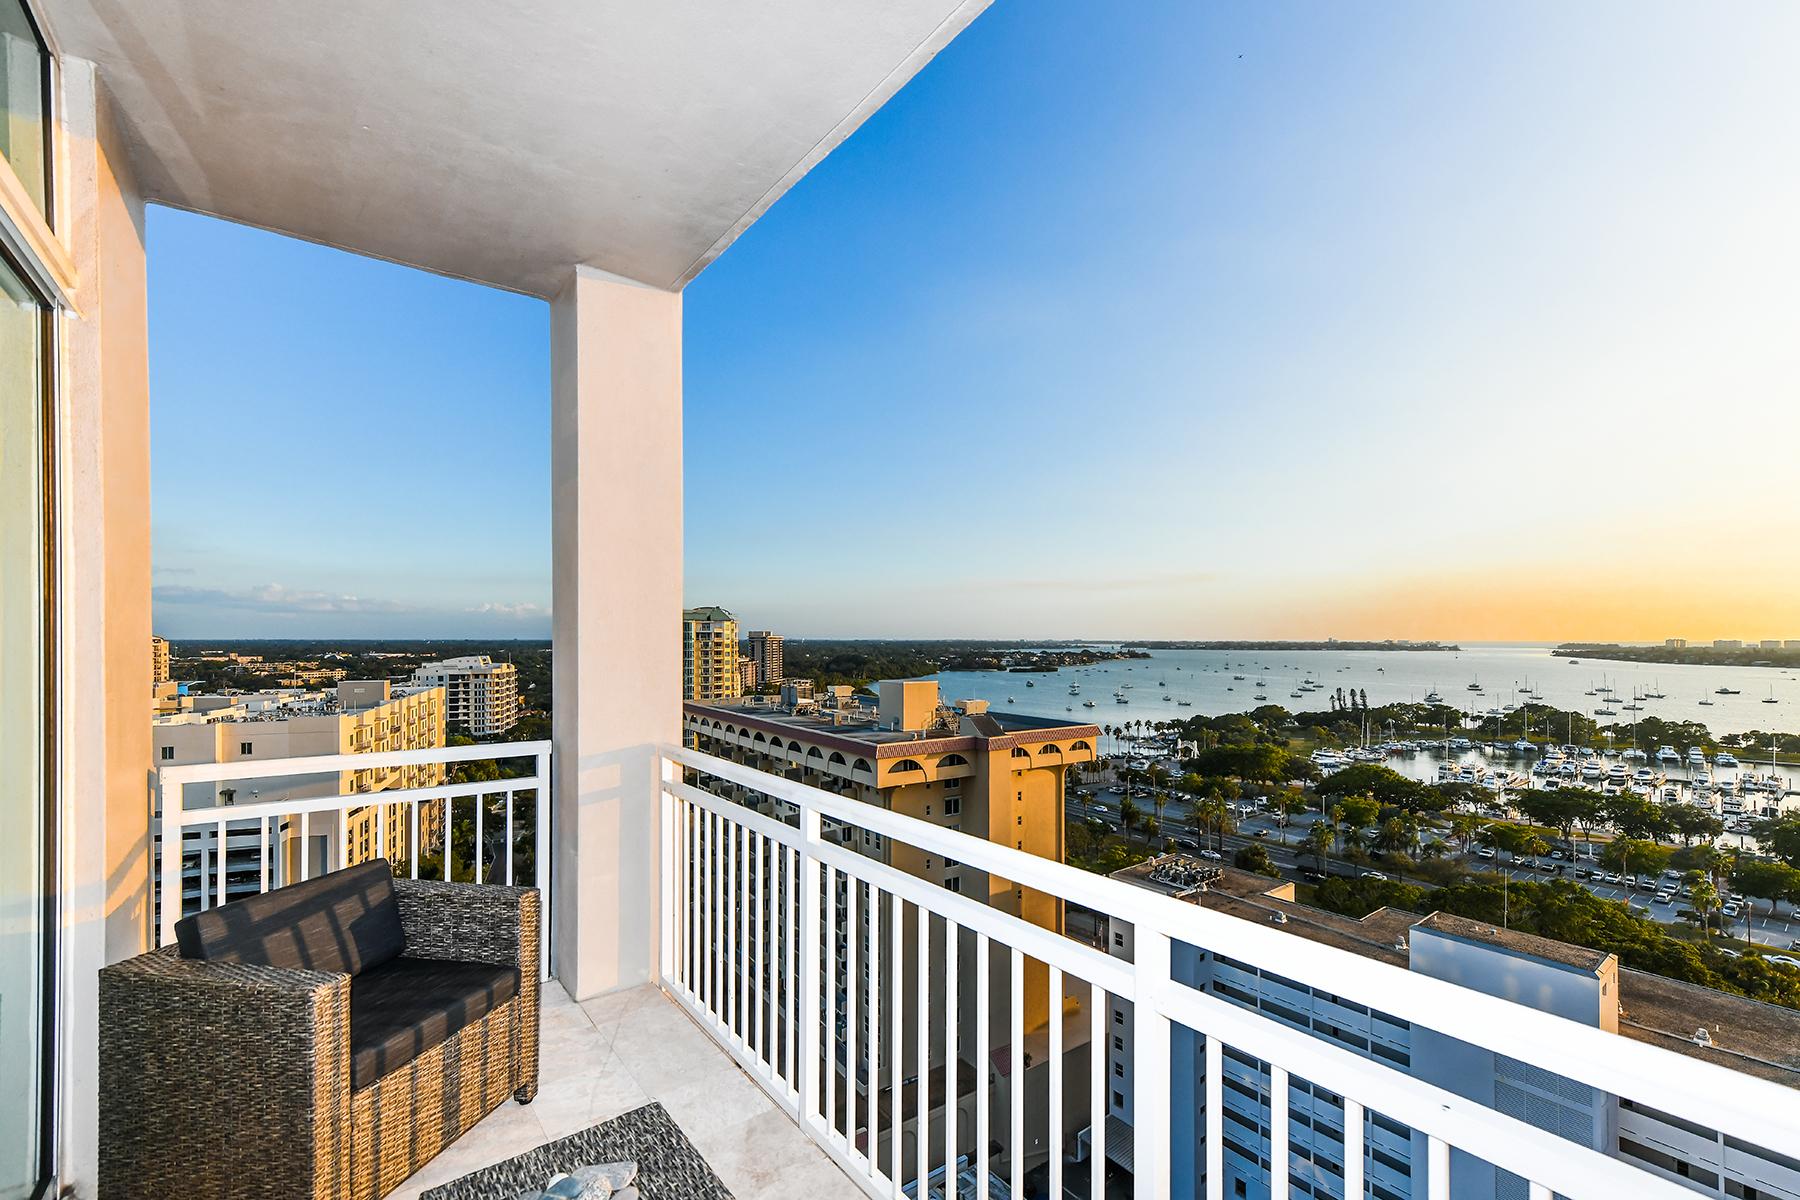 Condominium for Sale at 1350 MAIN RESIDENTIAL 1350 Main St 1606, Sarasota, Florida 34236 United States